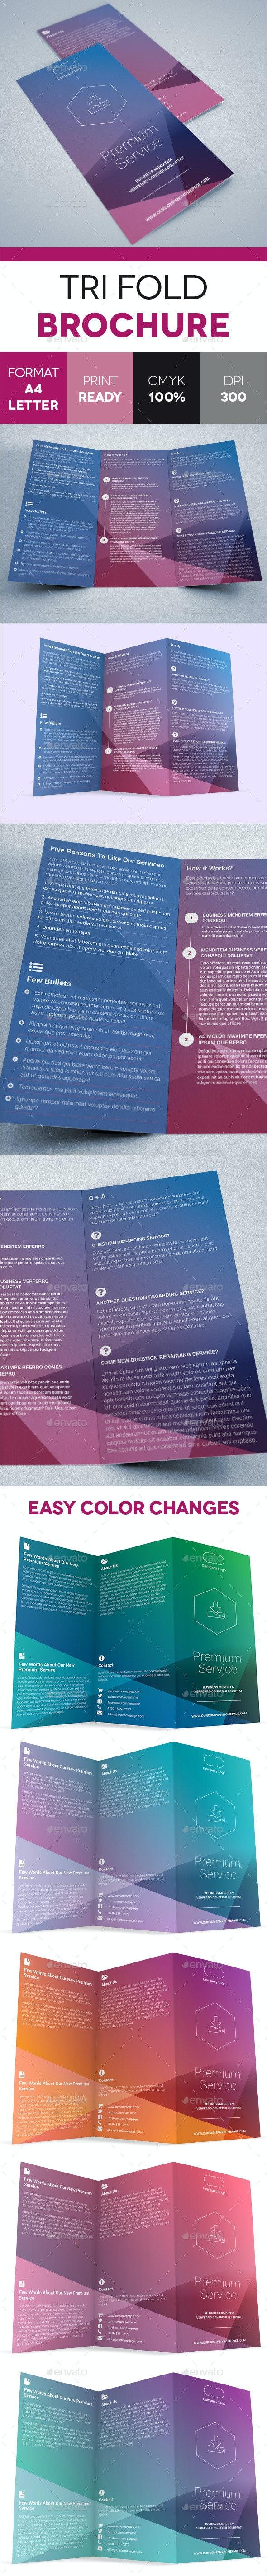 Simple Business Brochure - Corporate Brochures